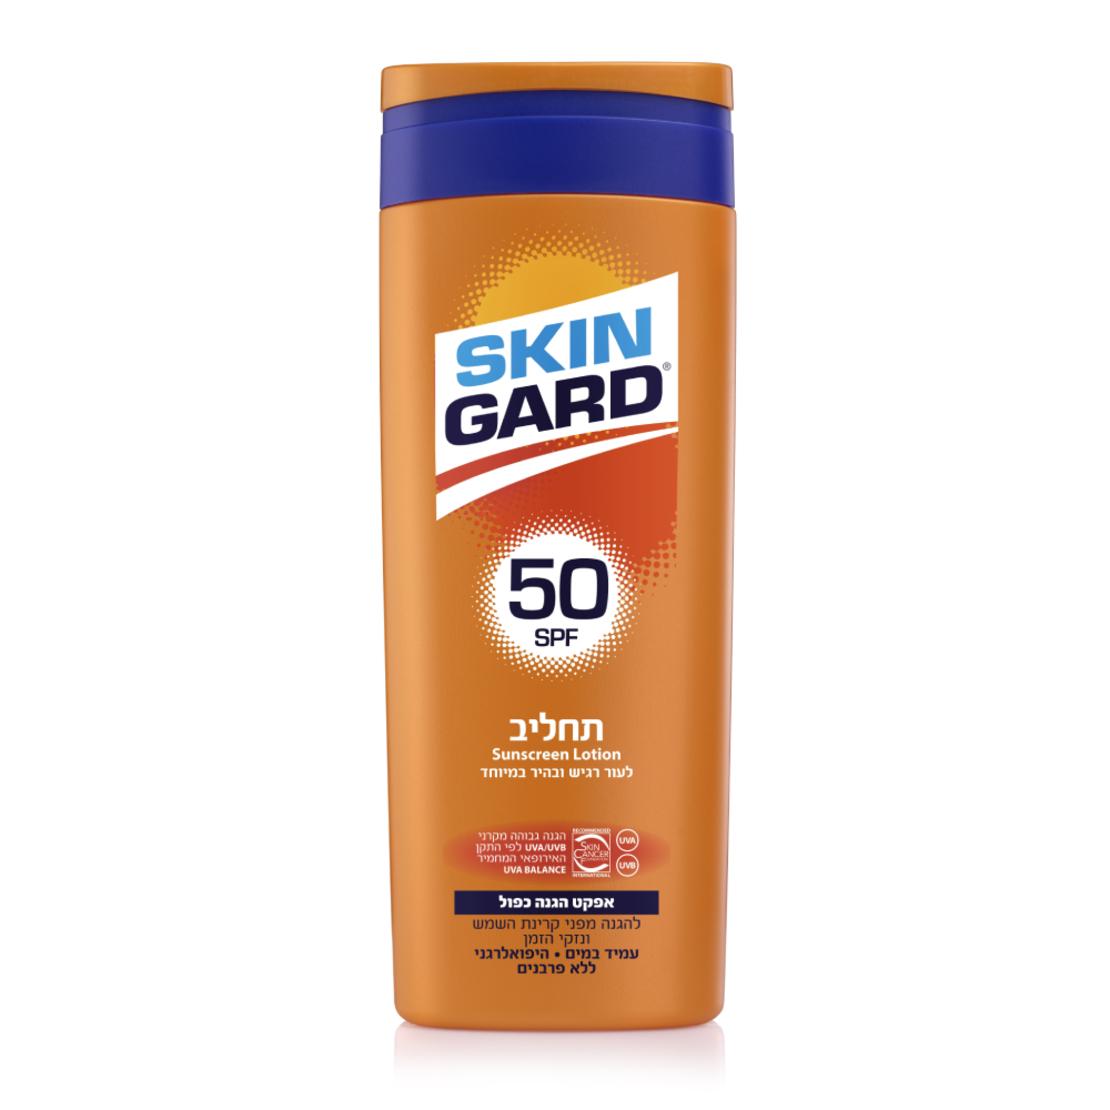 סקין גארד תחליב הגנה  50 SPF